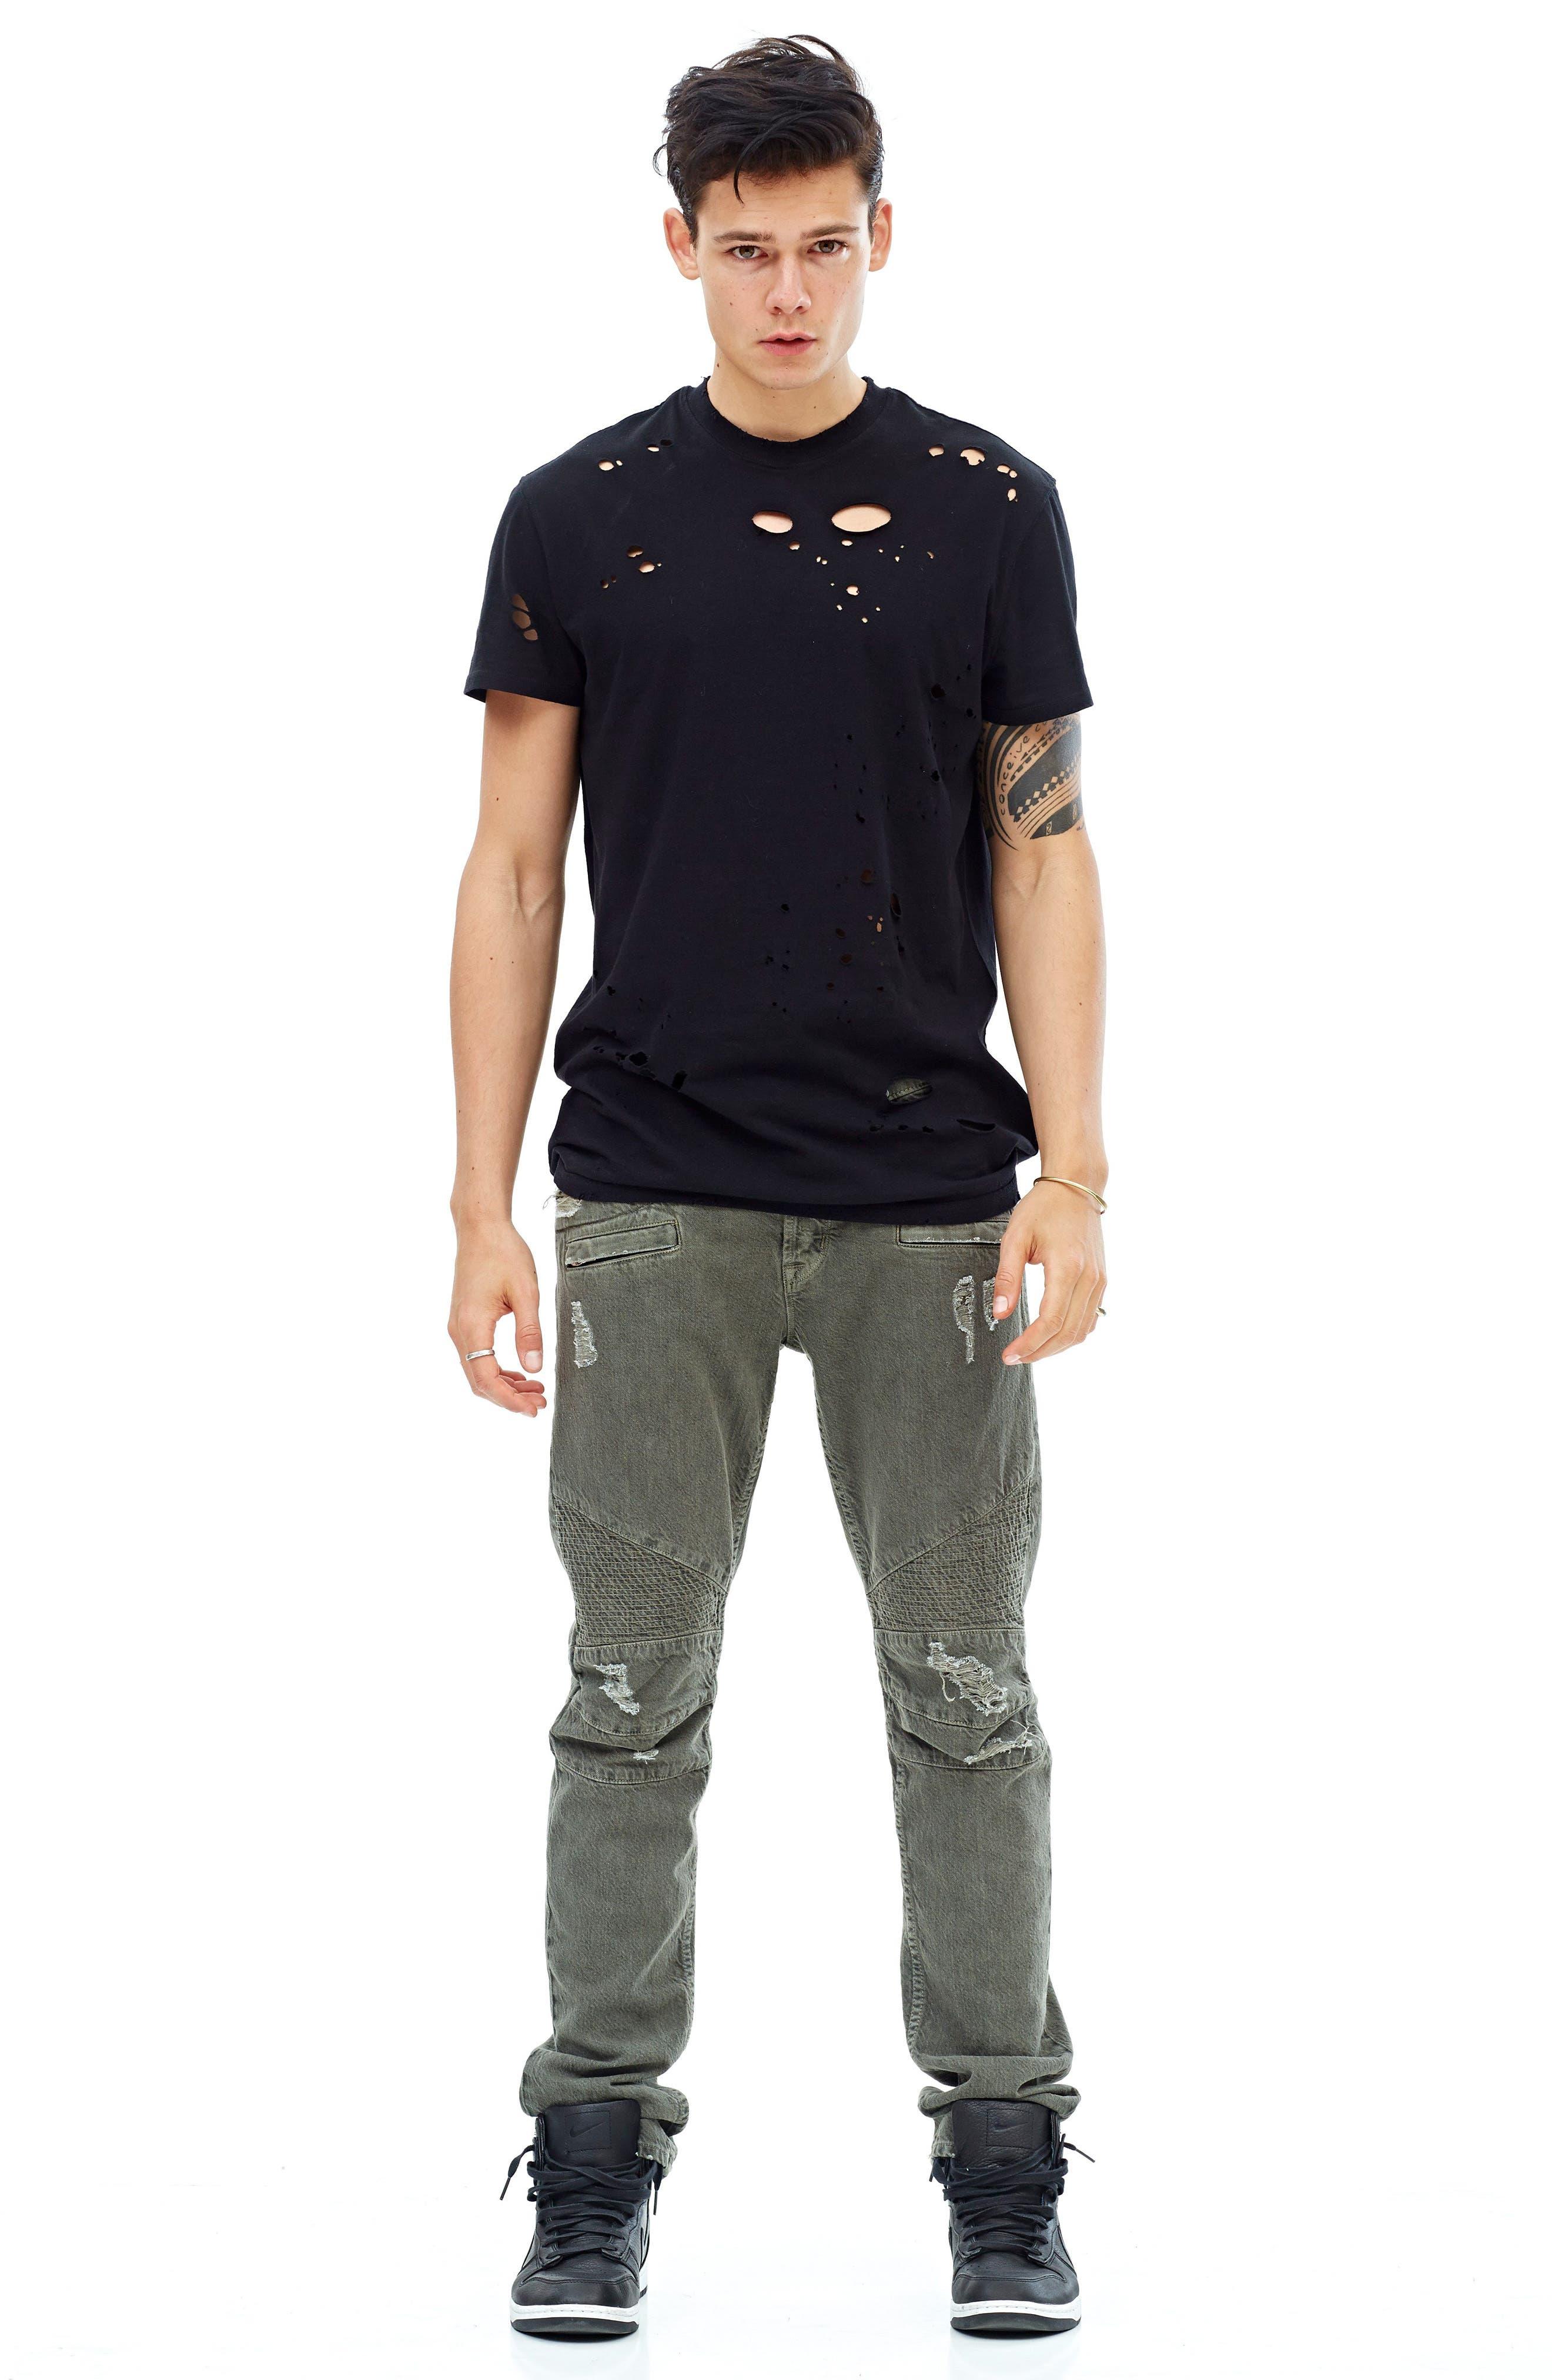 Blinder Biker Skinny Fit Jeans,                             Alternate thumbnail 6, color,                             Fortitude Green